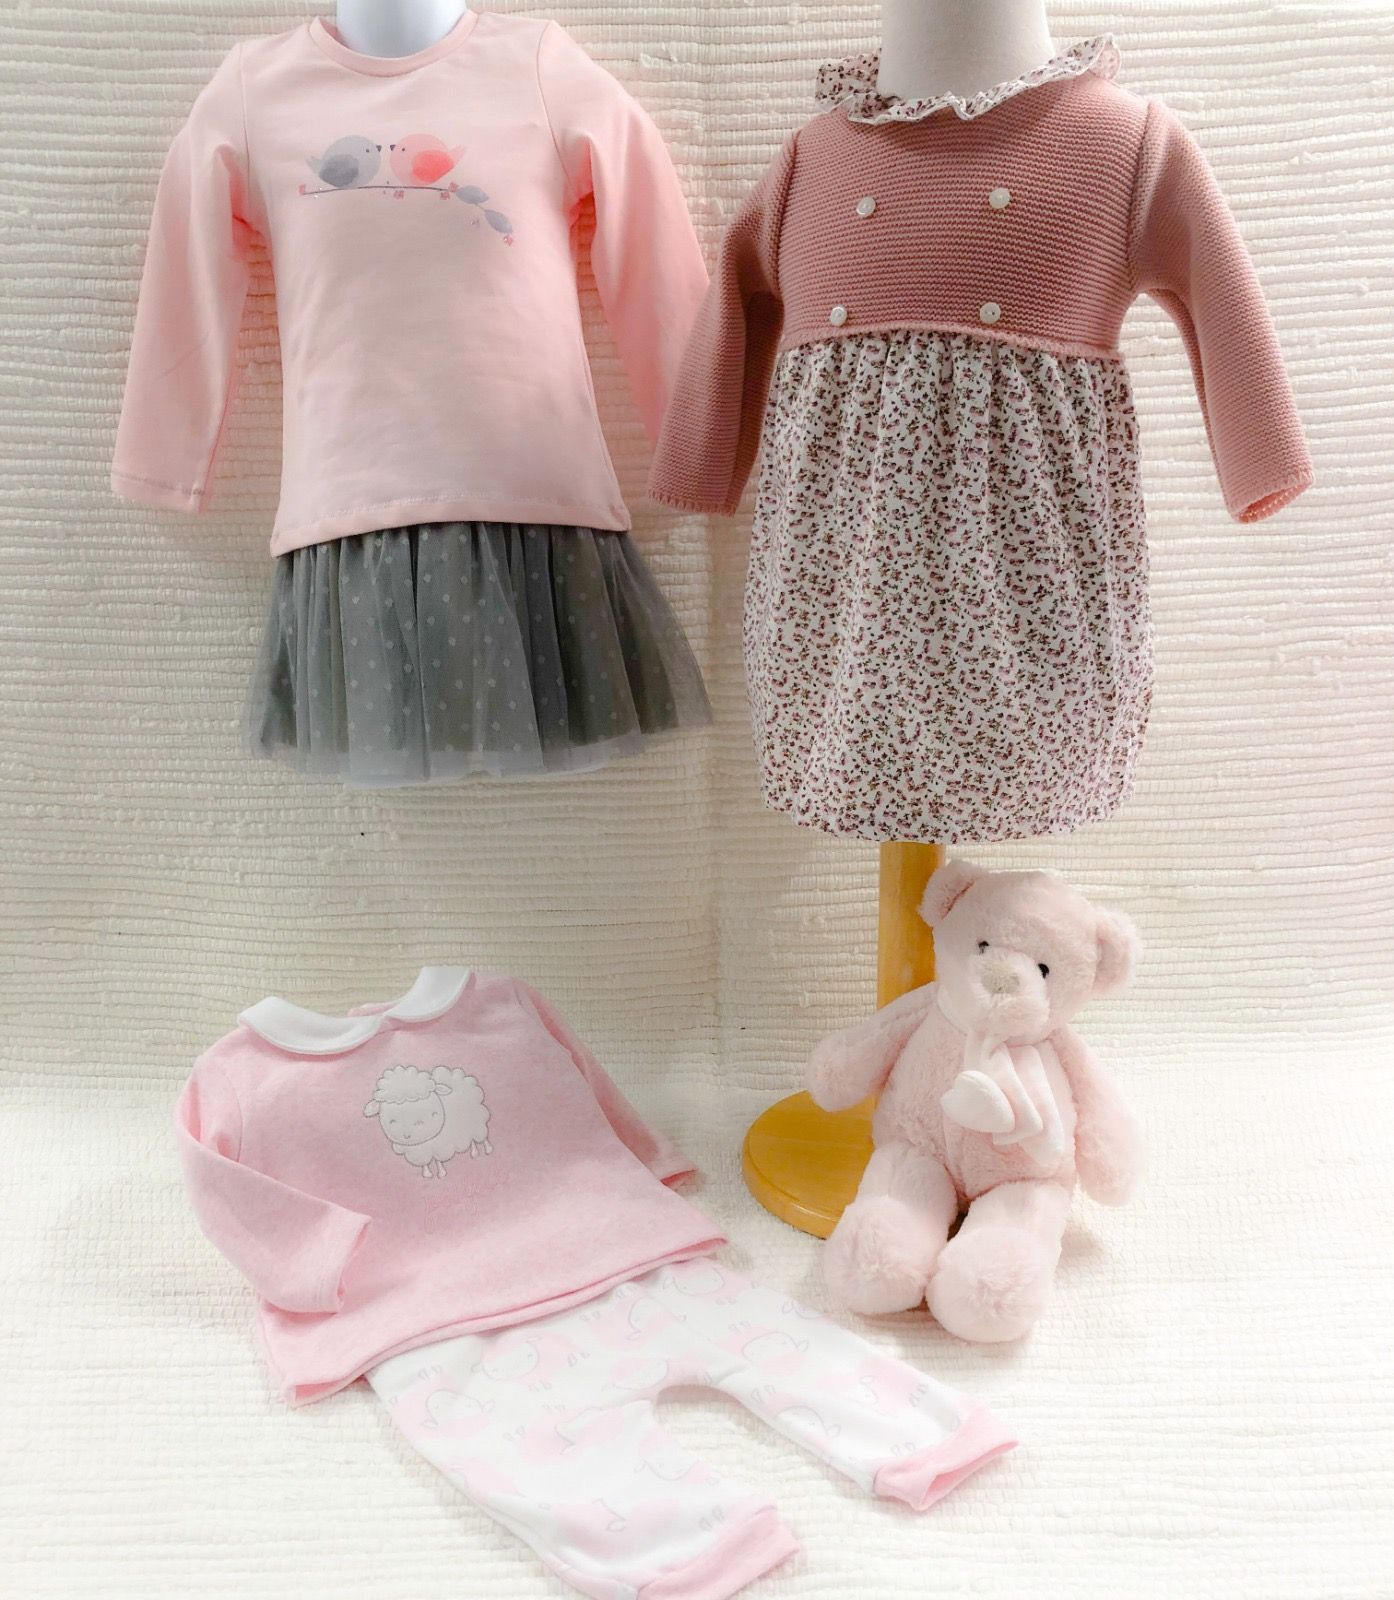 Girls Clothing Selection